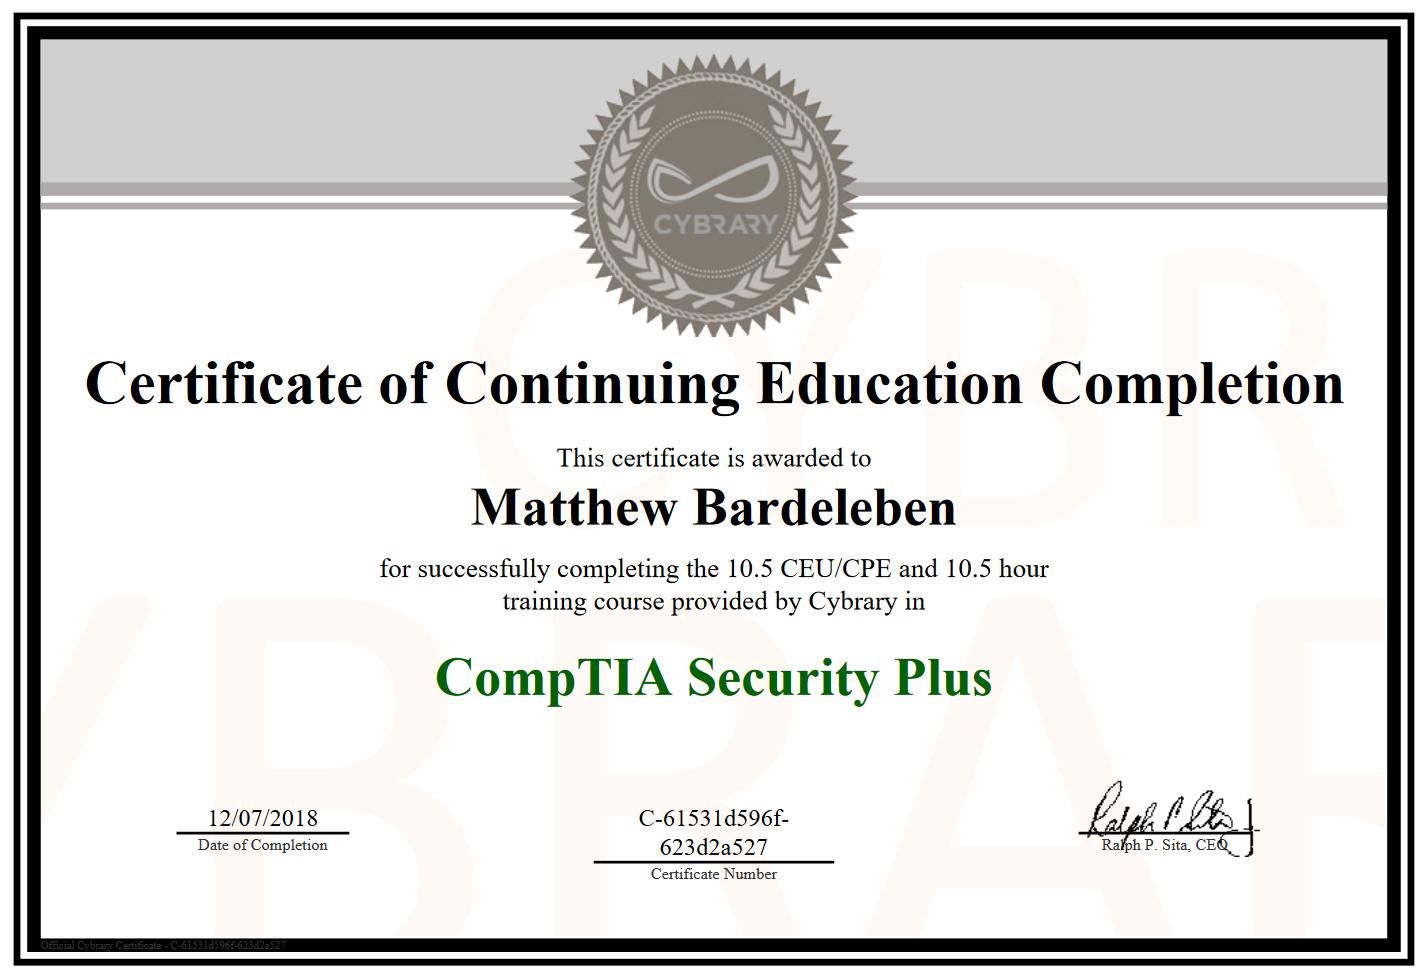 Matthew Bardeleben - CompTIA Security+ Course Certification - Cybrary.it - Matty Bv3